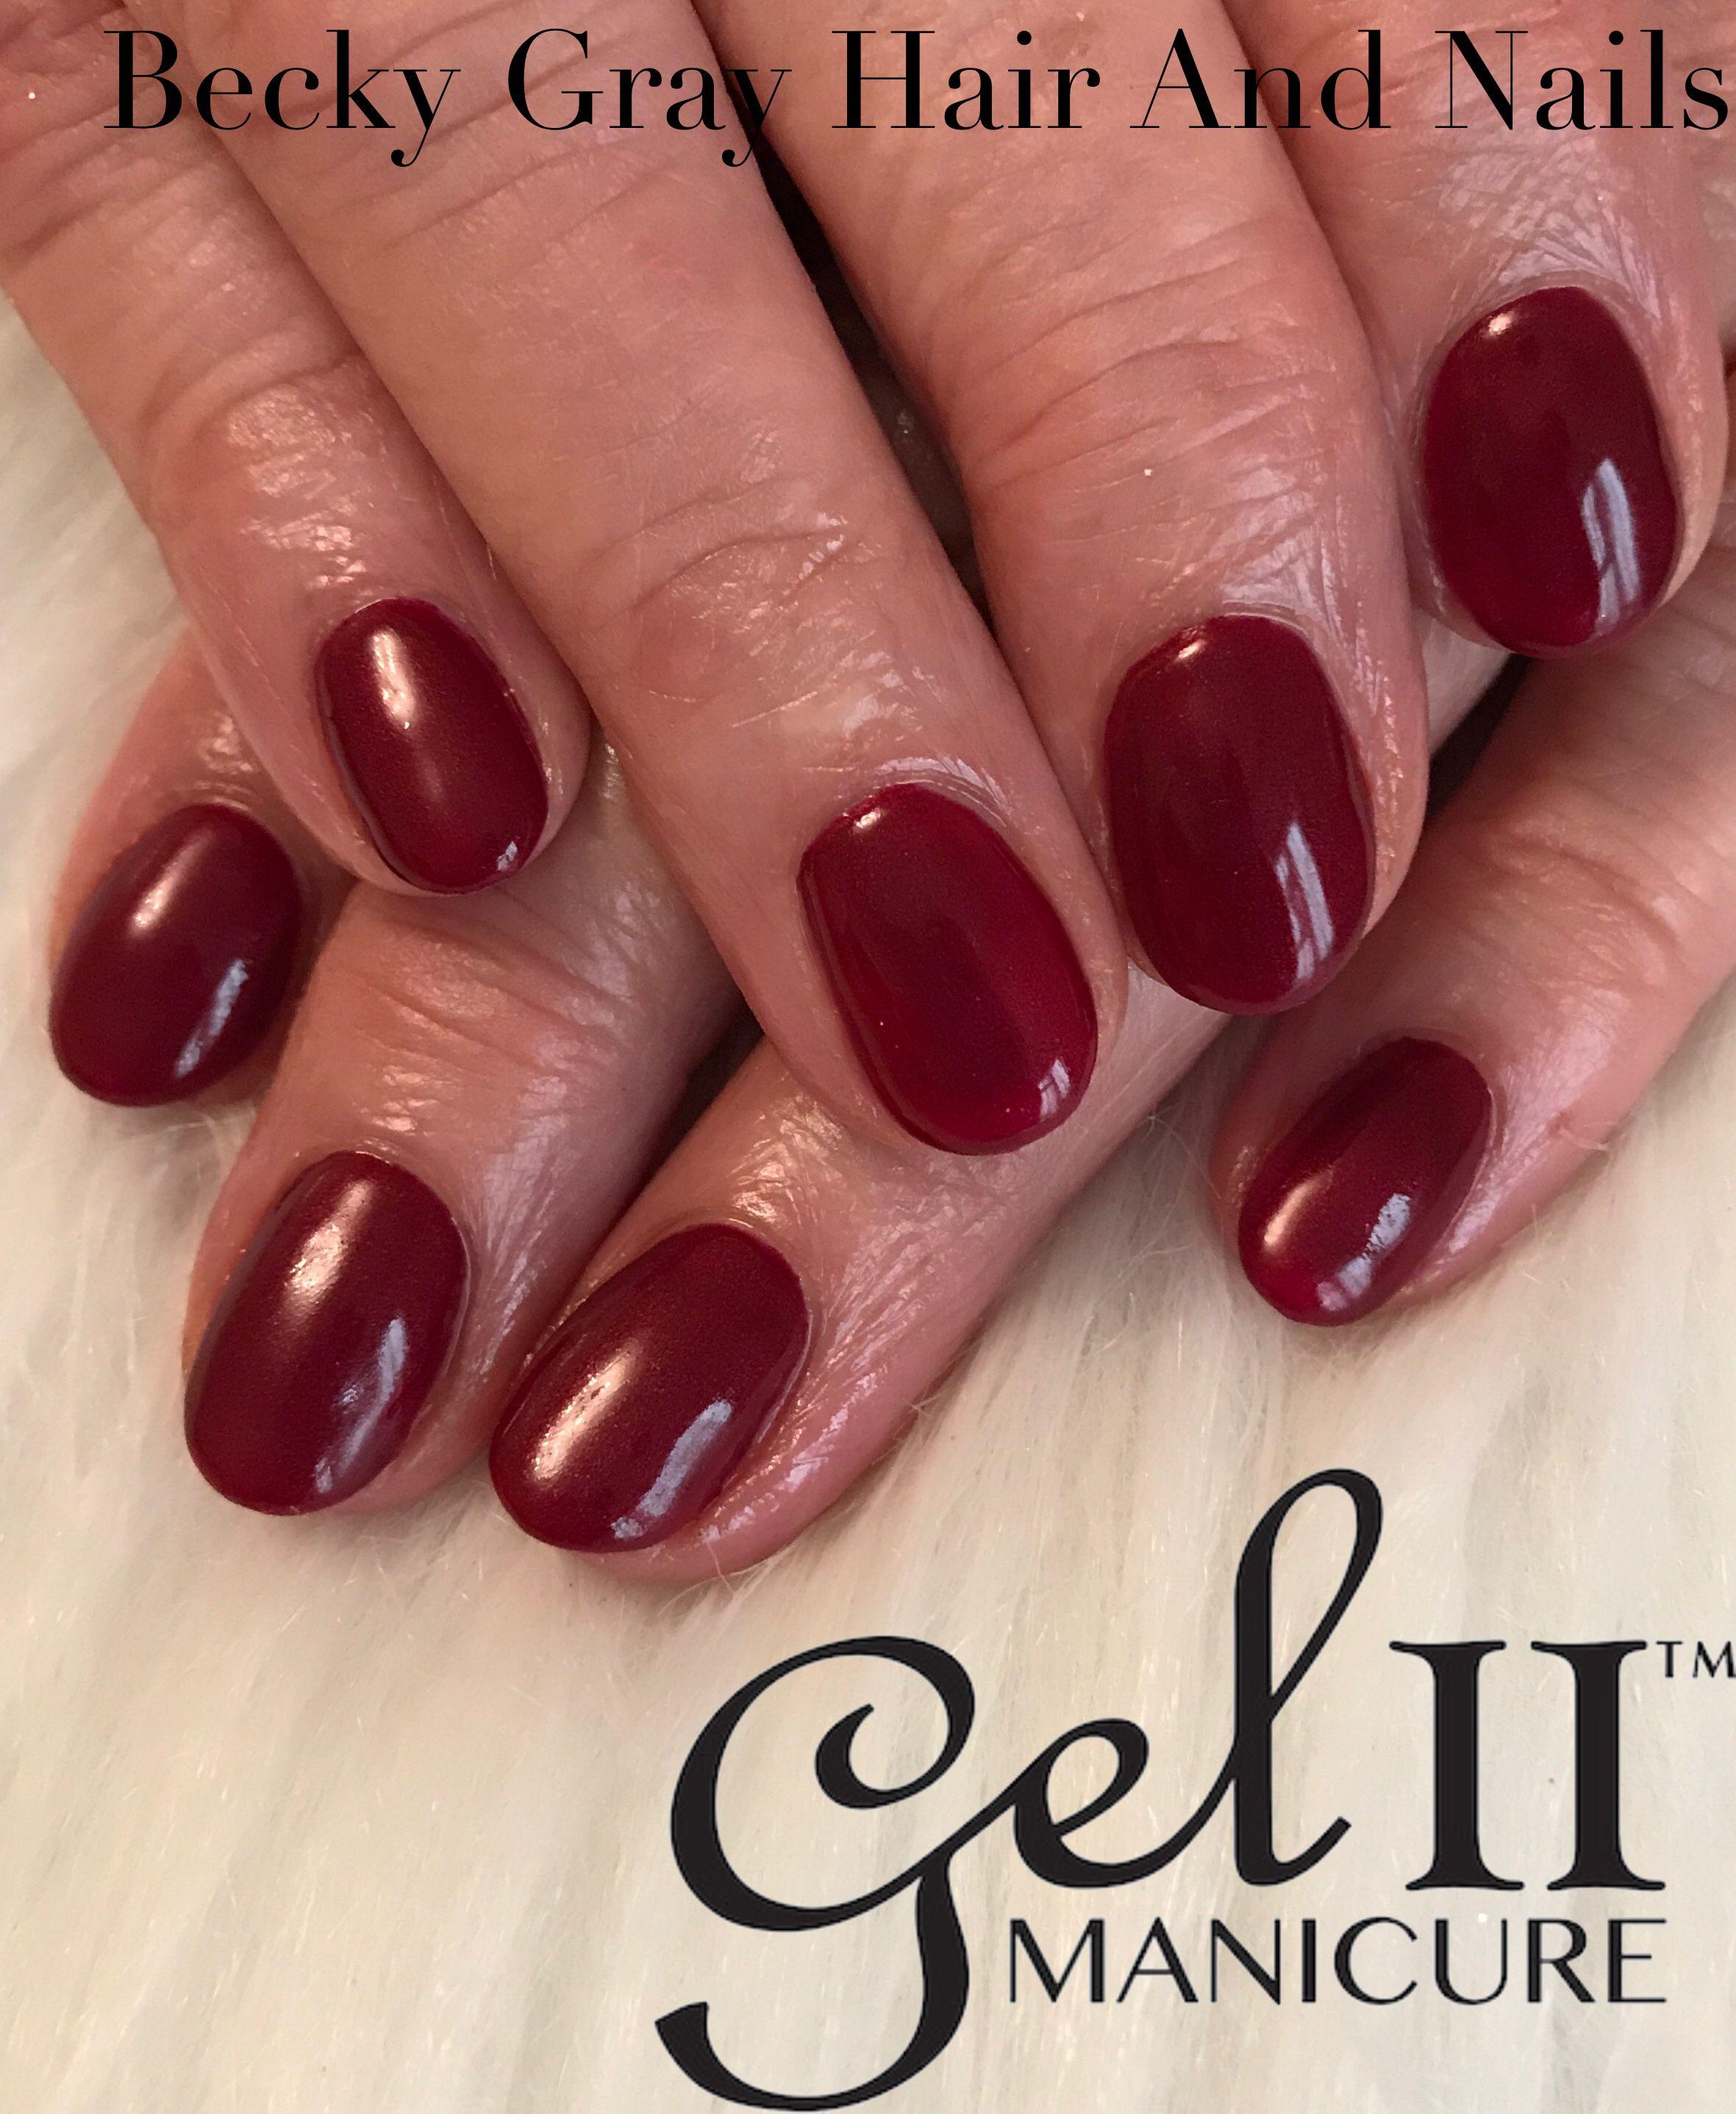 Gel ii manicure cactus wine  #gelii #geltwo #nailart #manicure #showscratch #scratchmagazine